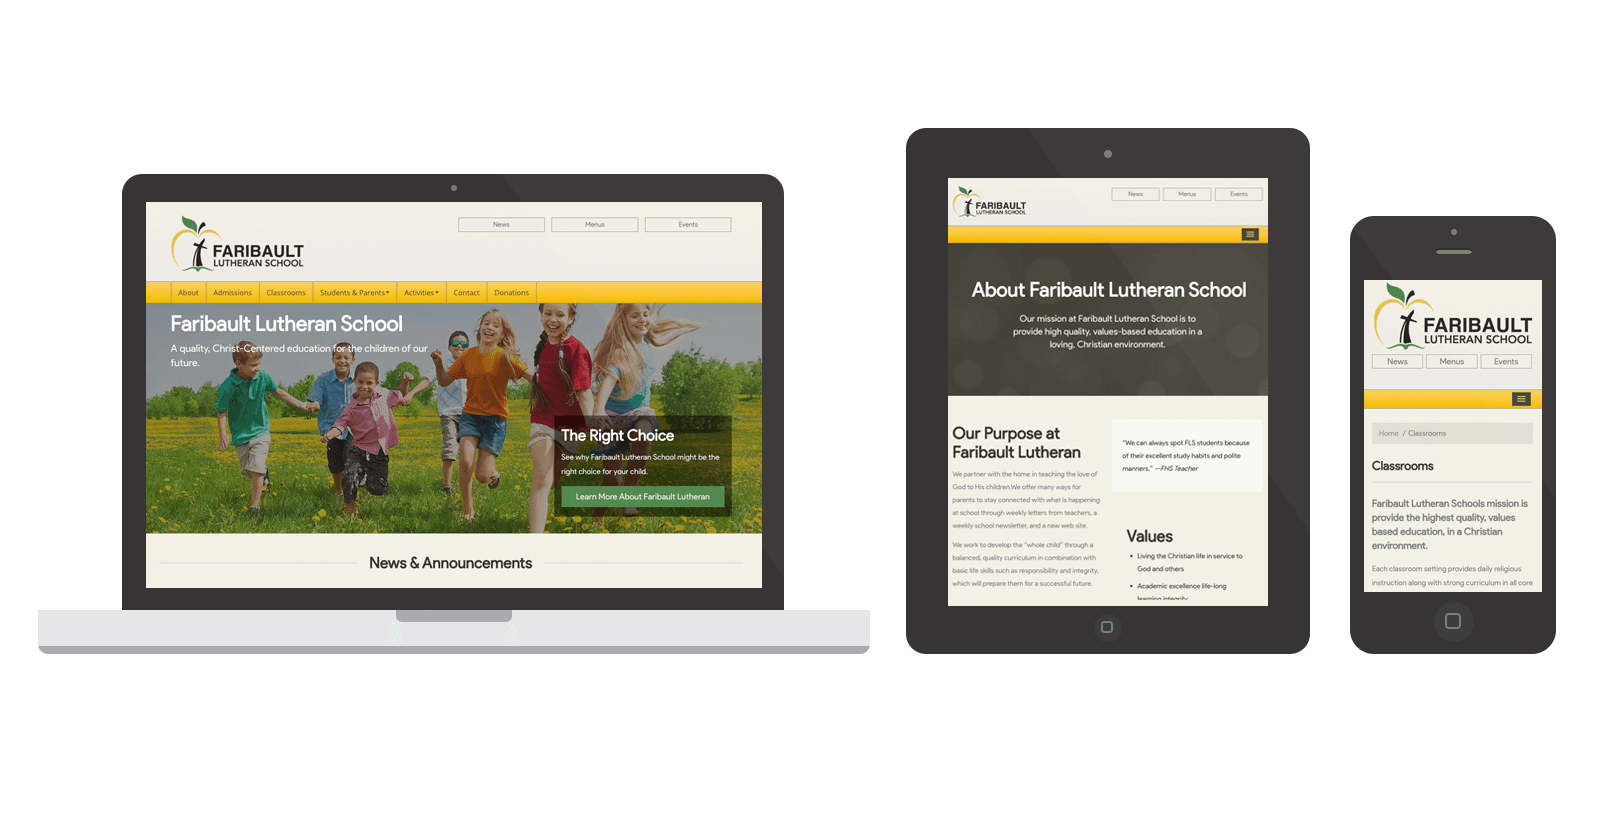 Faribault Lutheran School Web Design by Spark Logix Studios